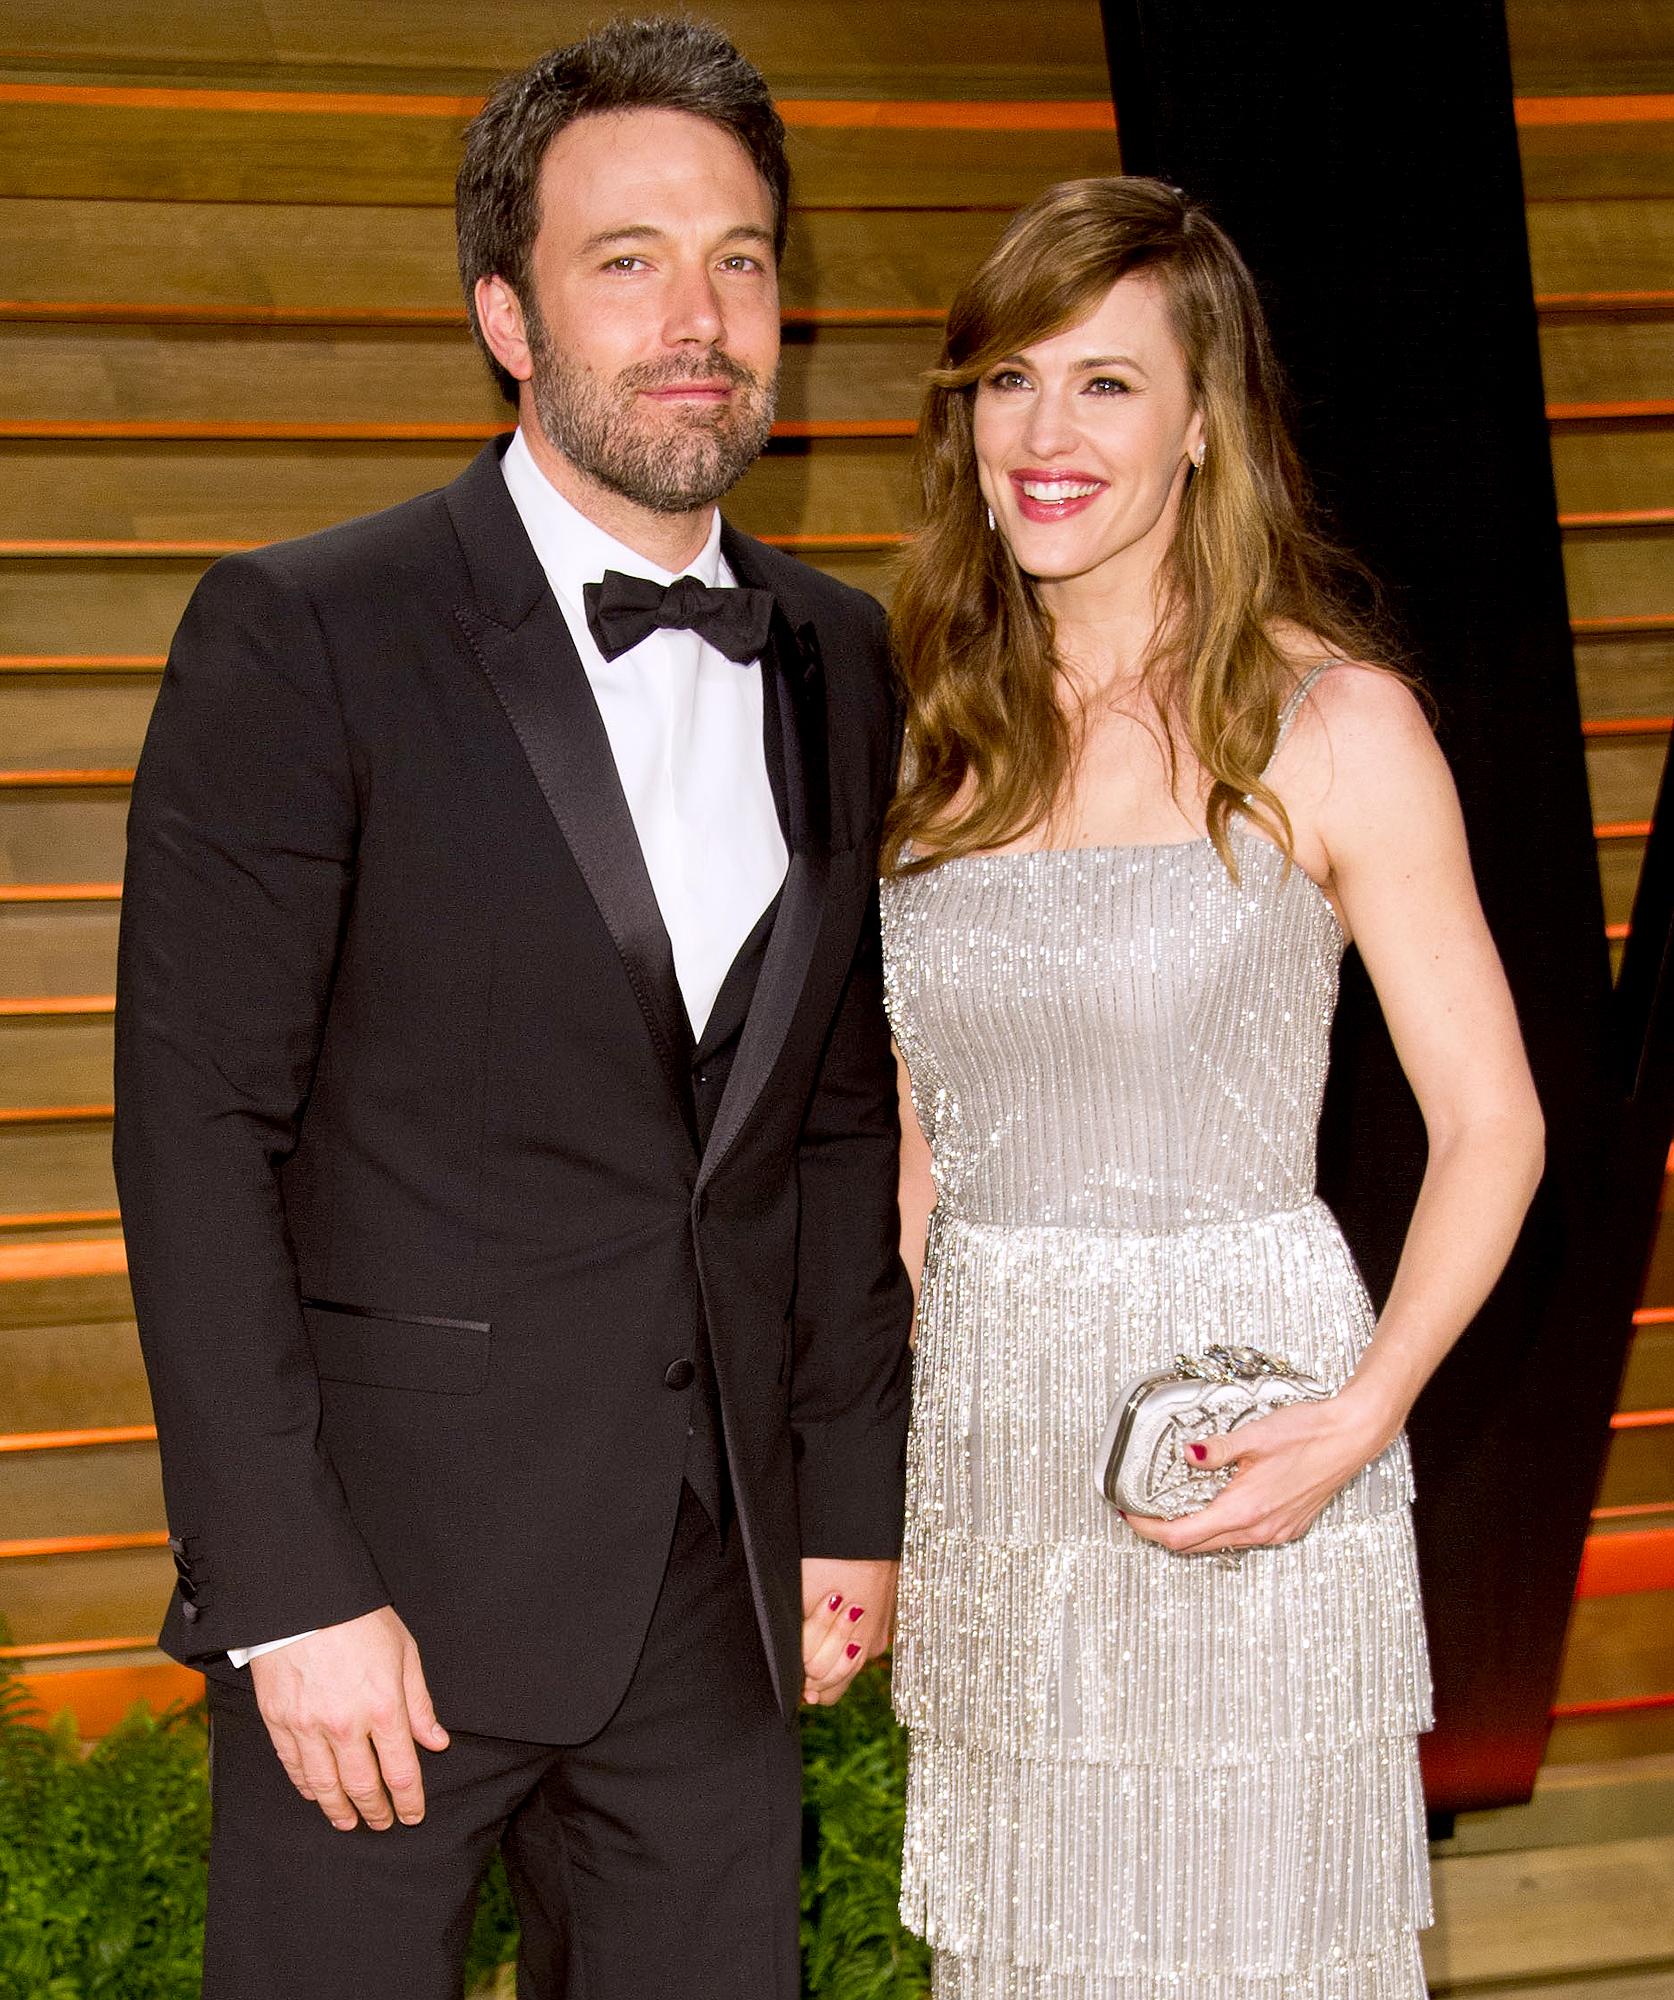 Jennifer Garner Will Still Dance With Ex Ben Affleck at Their Kids Weddings